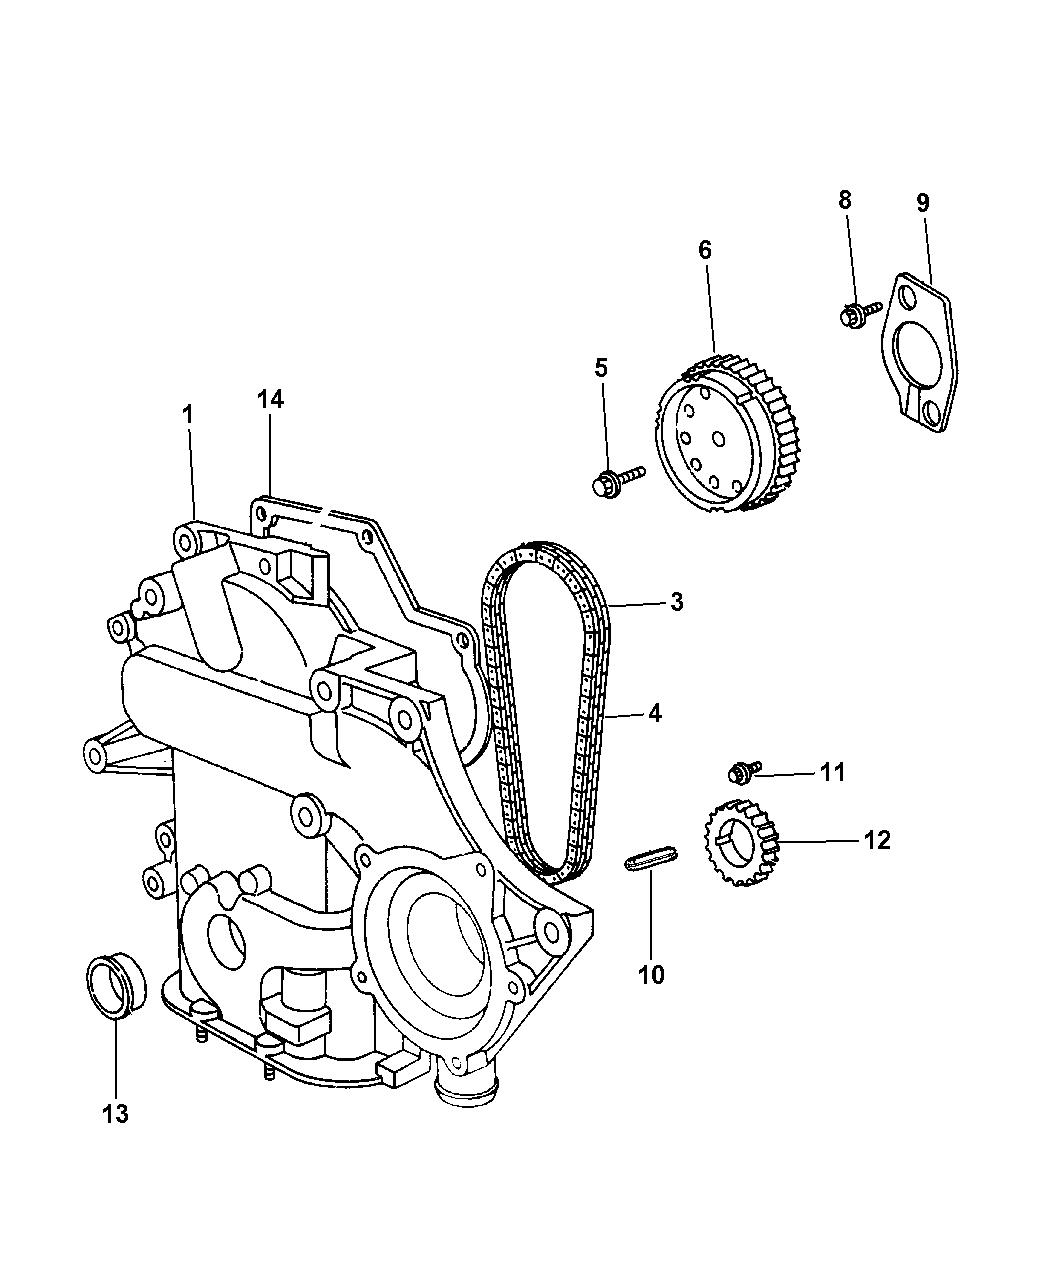 2005 Dodge Grand Caravan Timing Chain & Cover - Mopar Parts